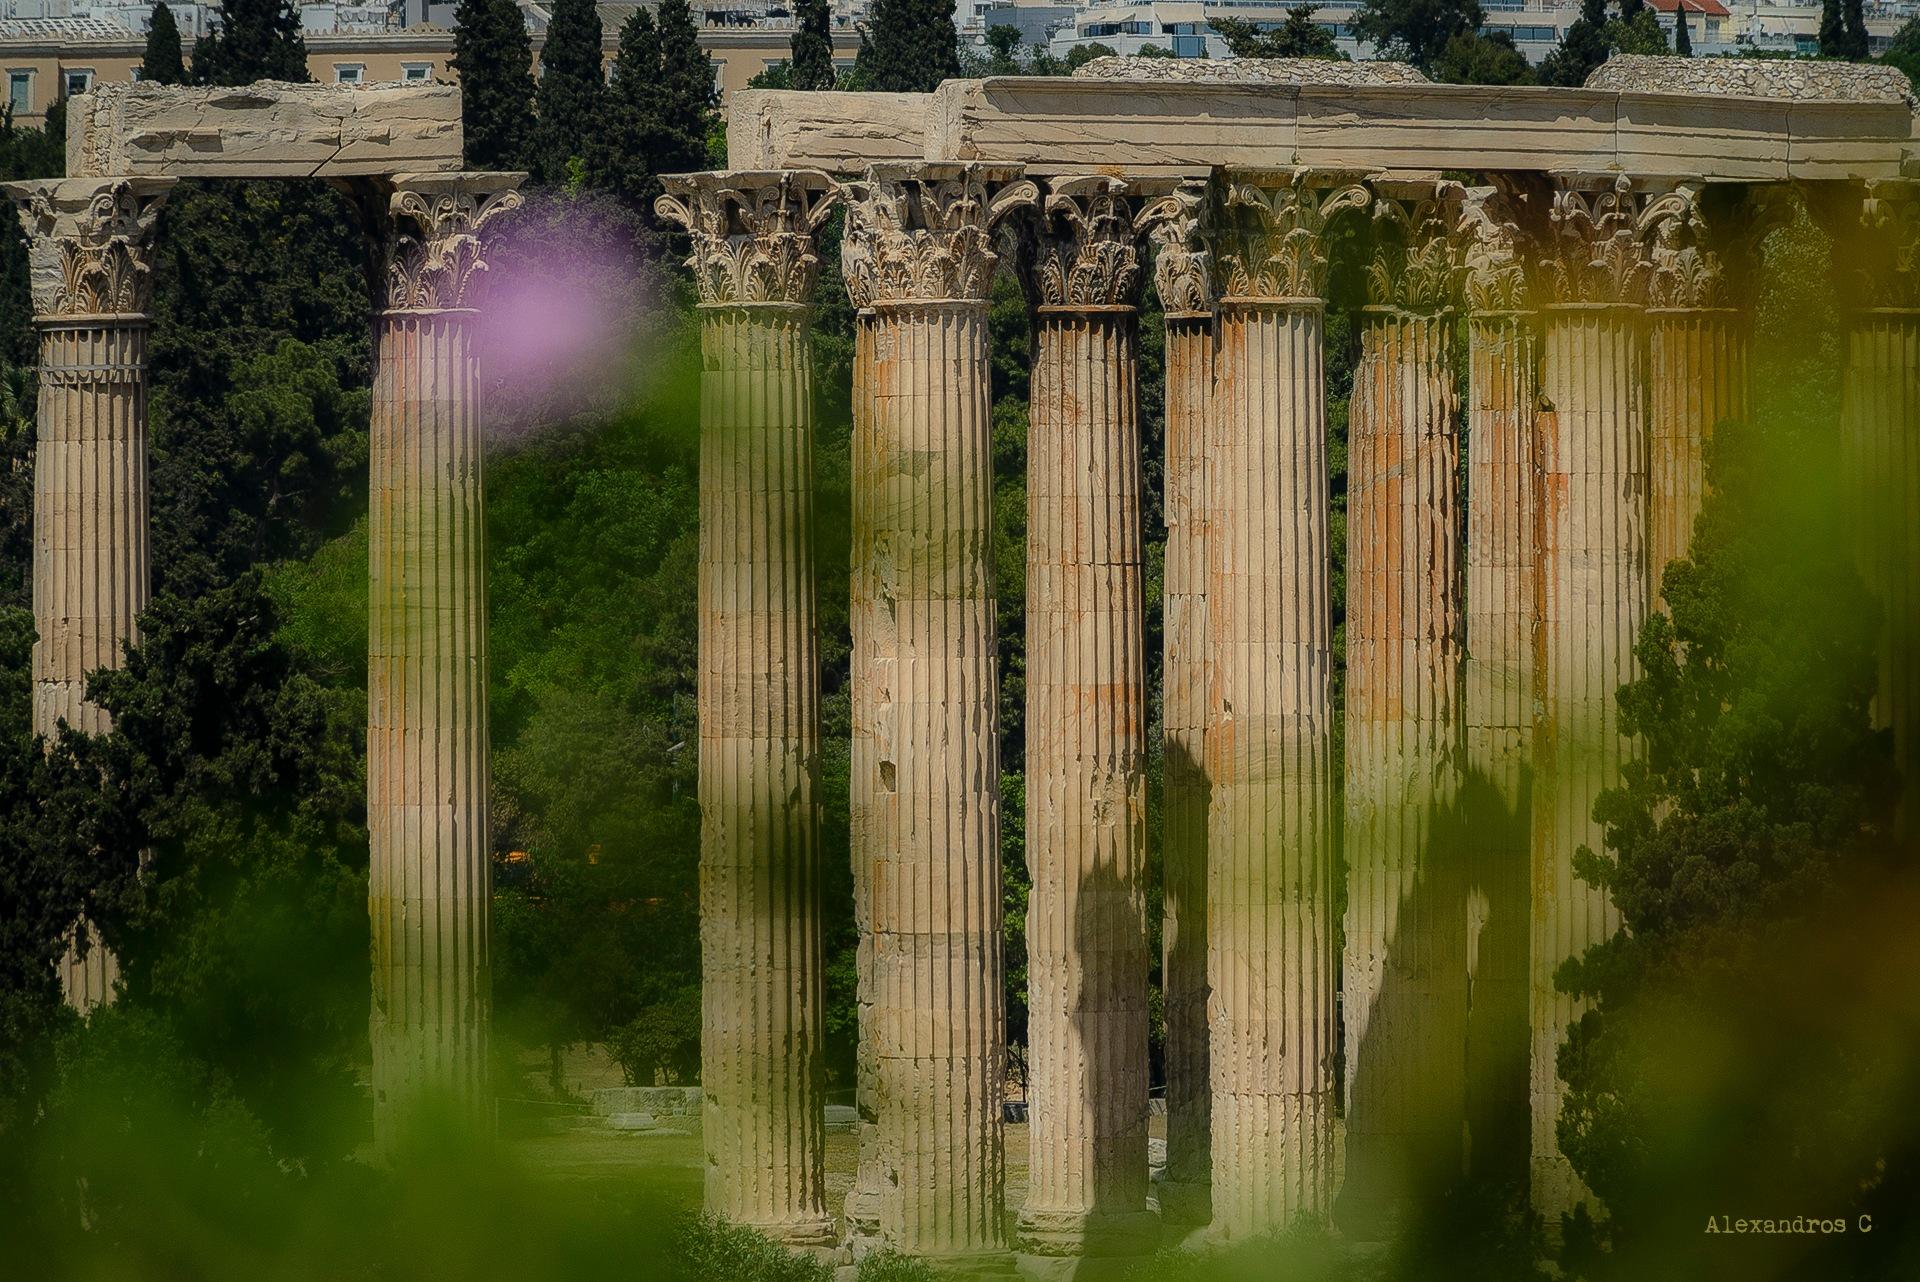 Temple of Zeus by Alexandros C